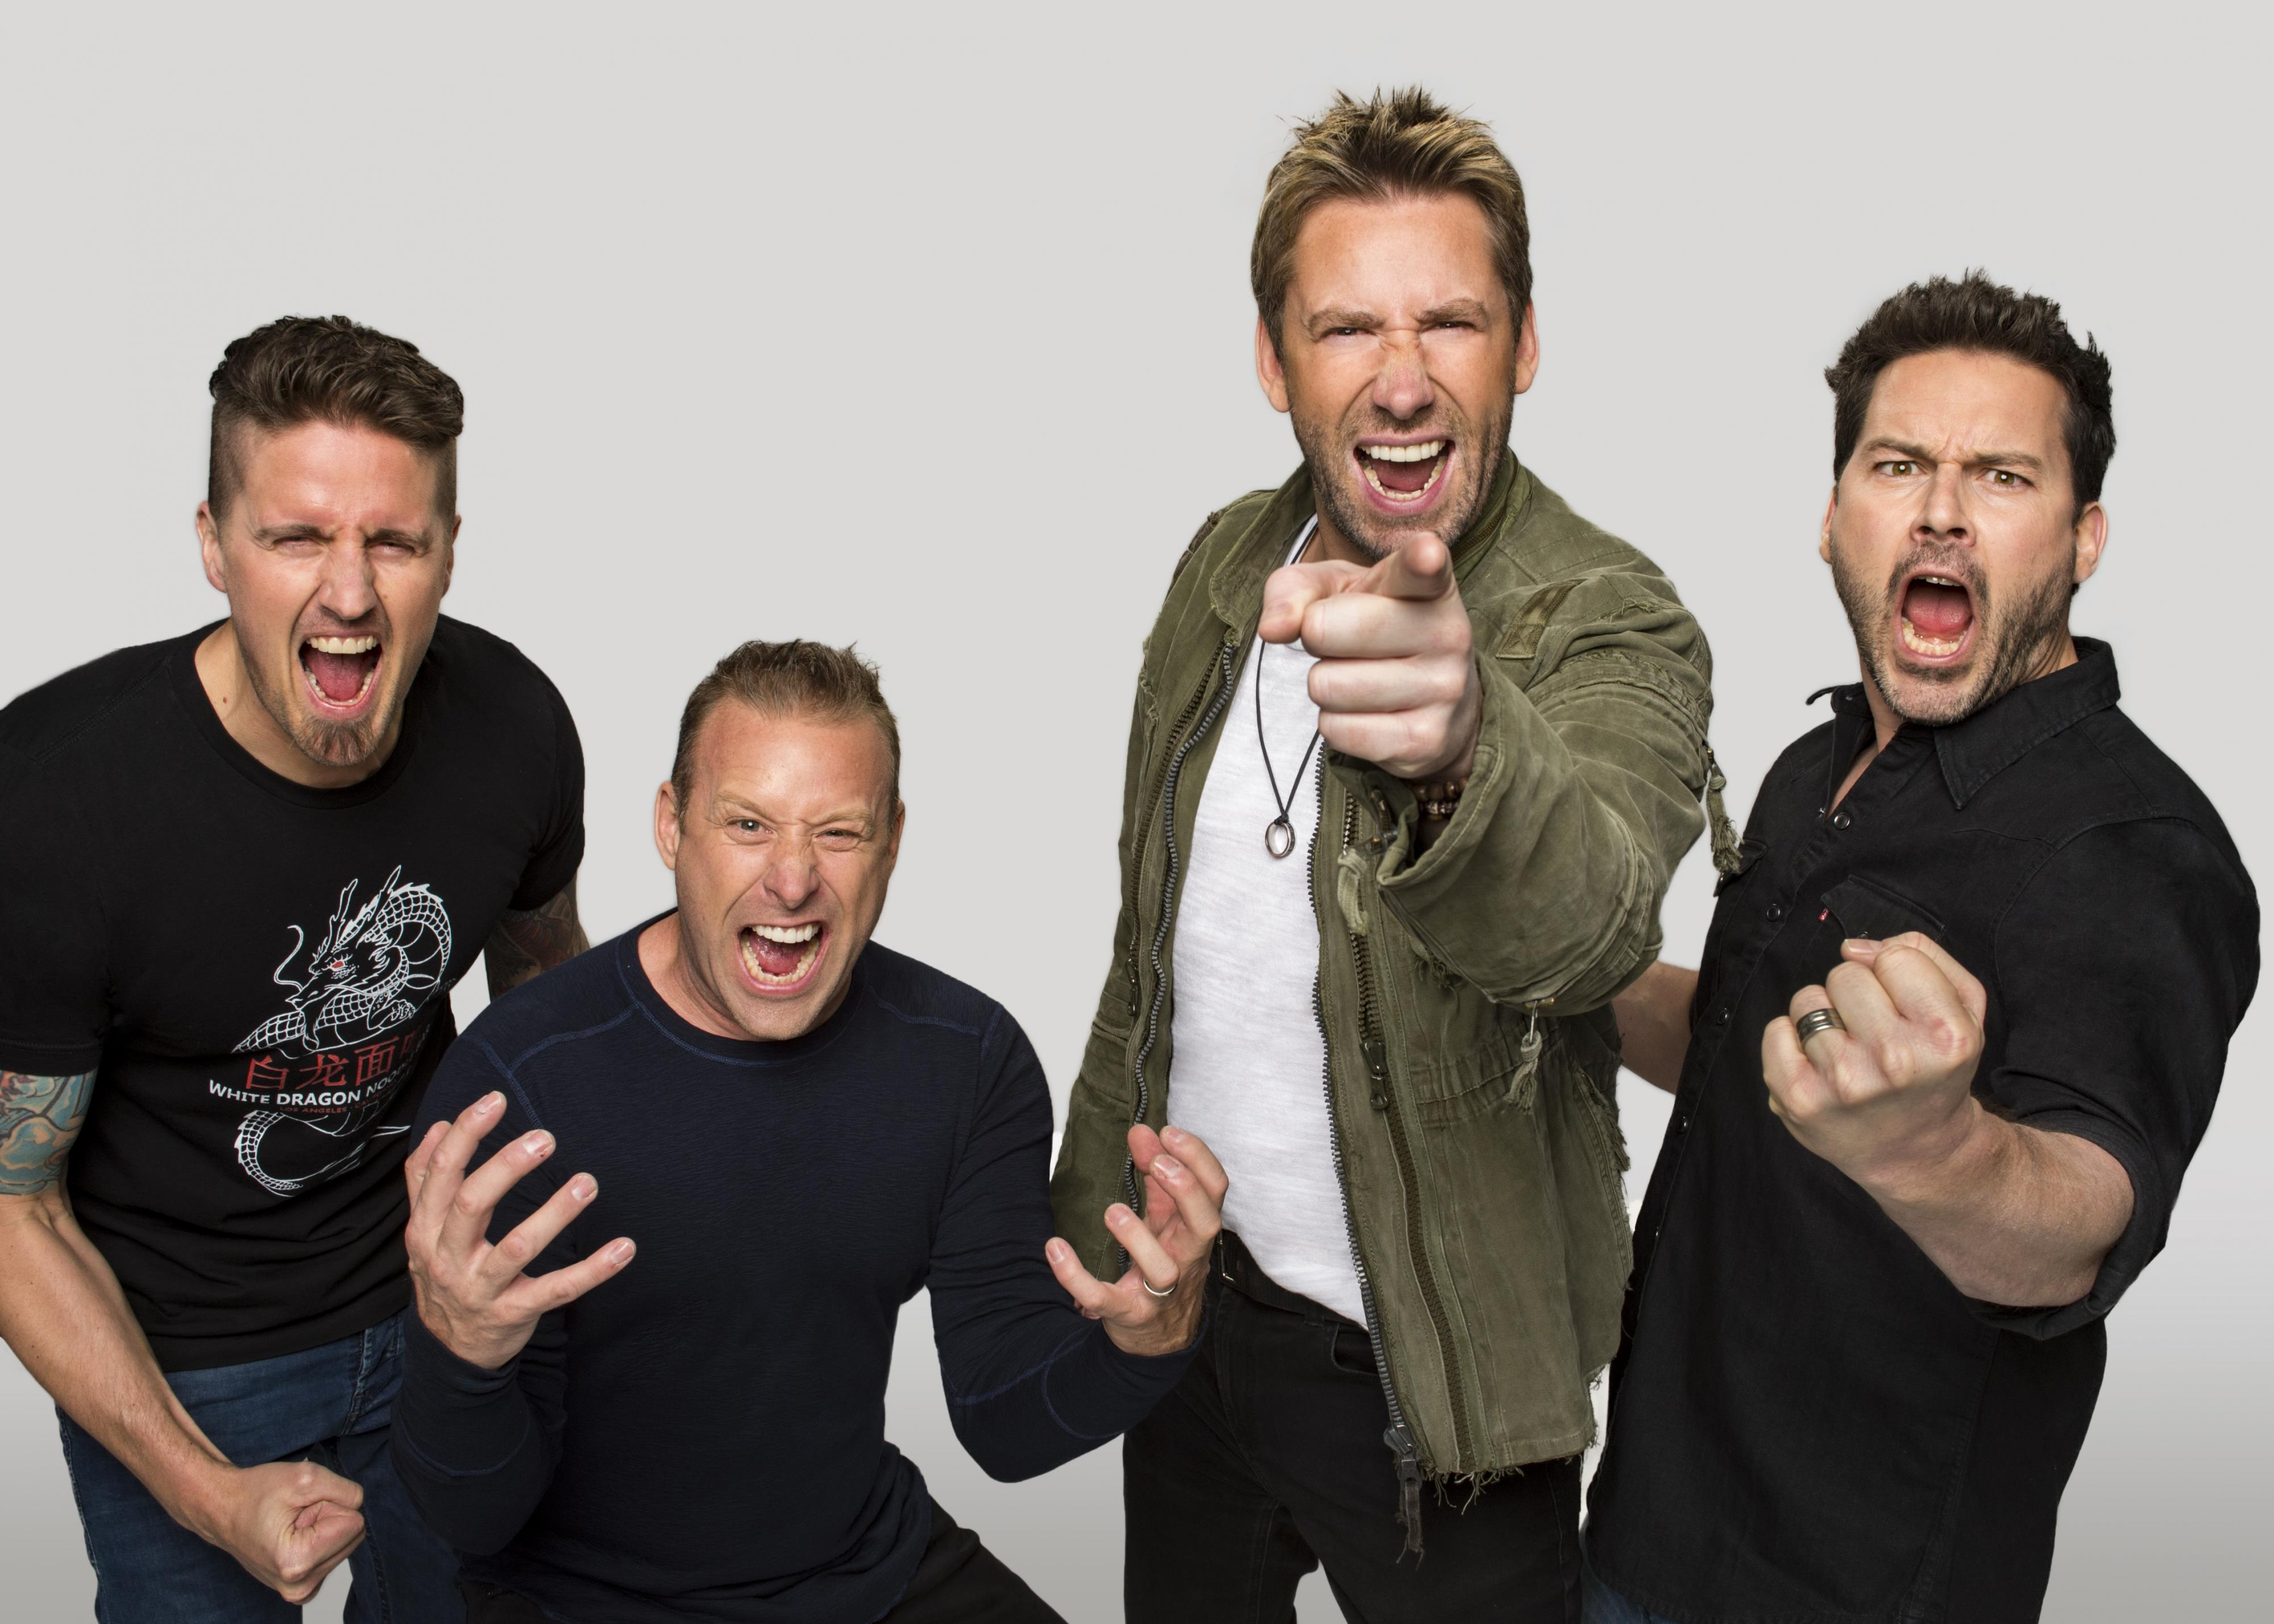 Nickelback concert dates in Sydney